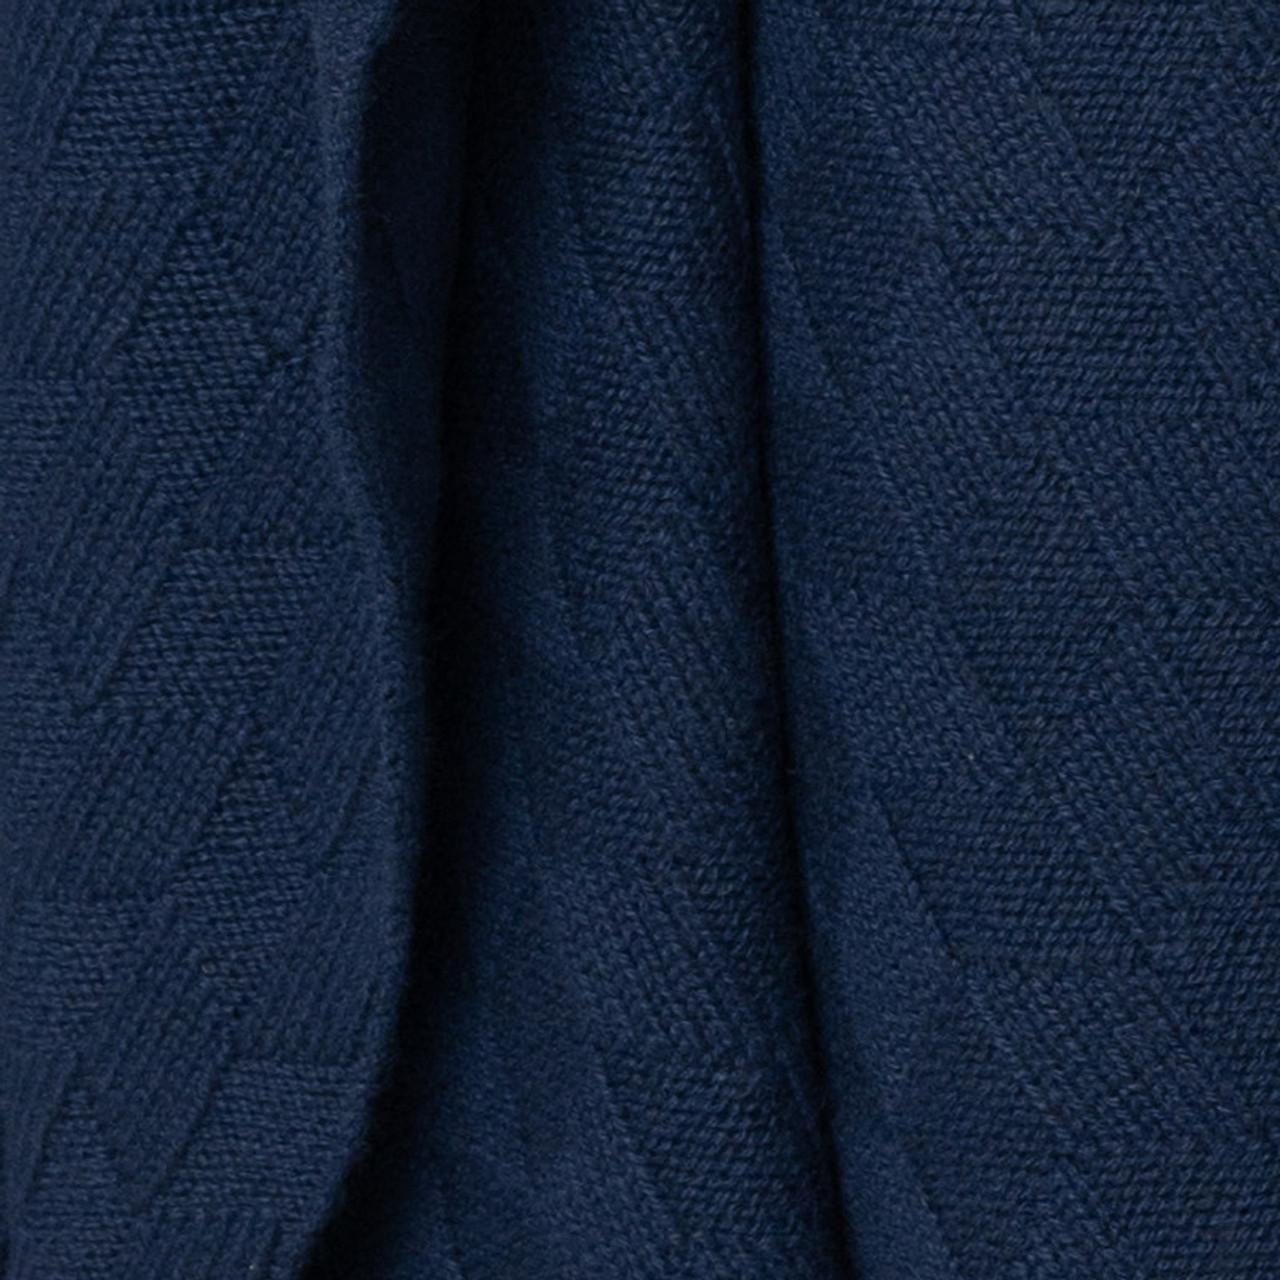 Dark Navy Diamond Lattice Knit Cashmere Throw